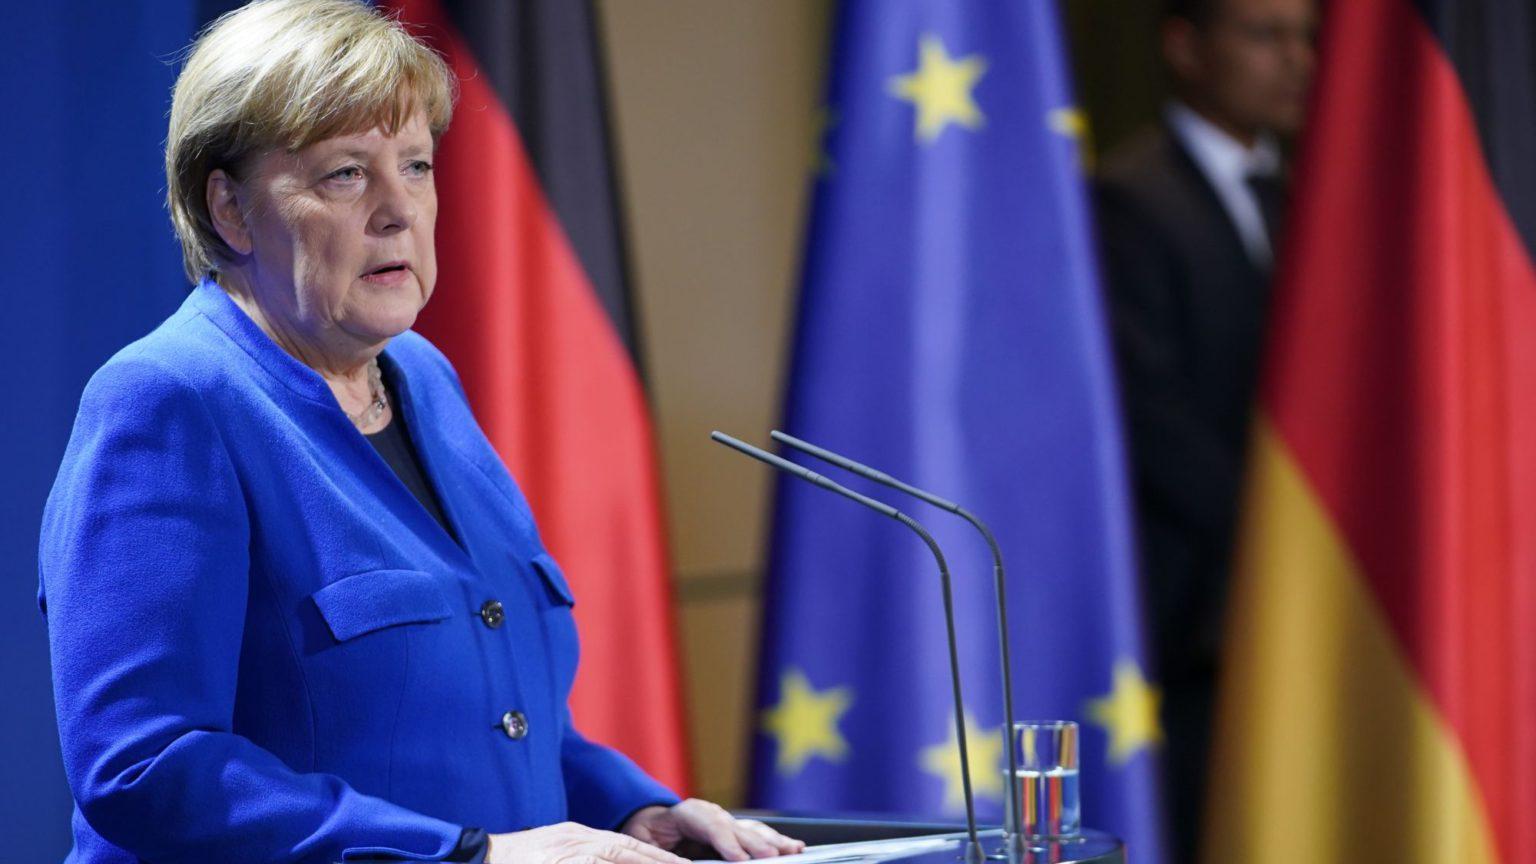 Germany has succumbed to panic